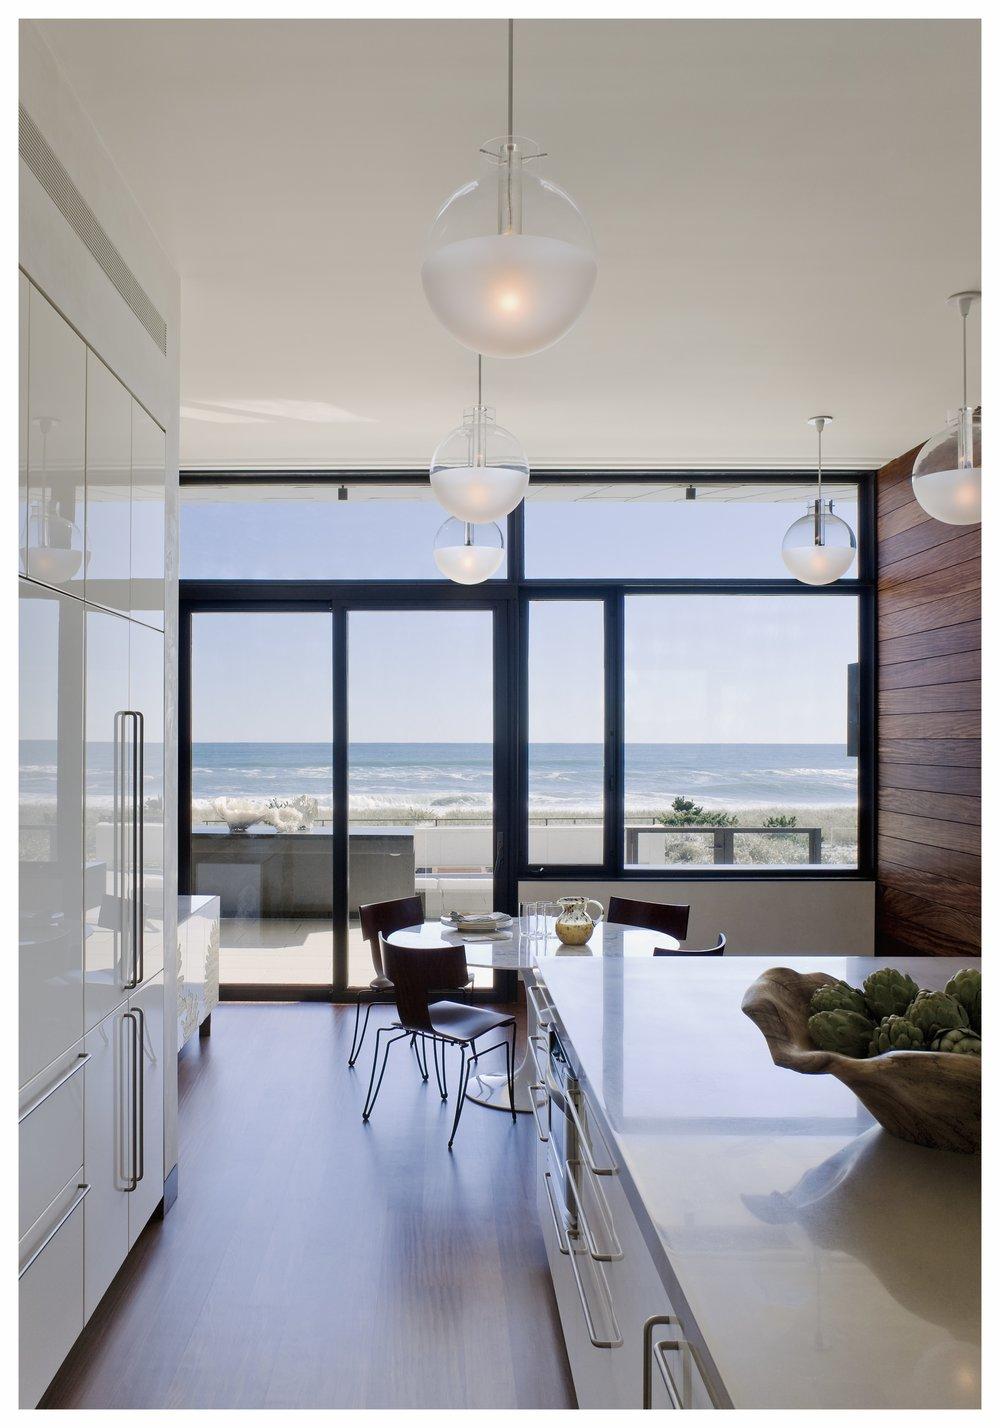 Southampton Beach House | Southampton, NY | Alexander Gorlin Architects